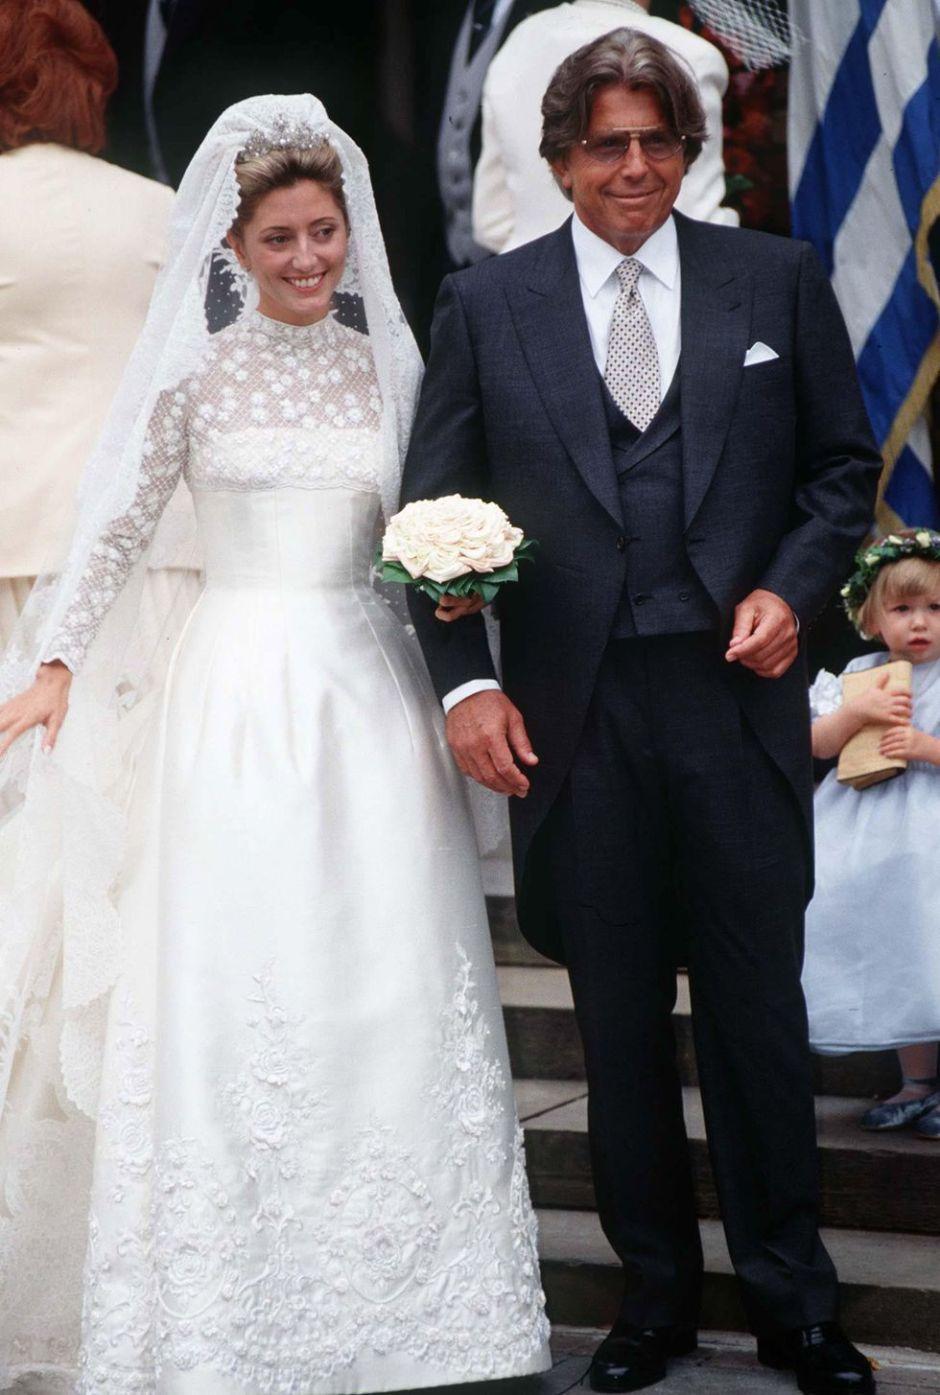 princess-marie-chantel-of-greece-and-her-father-robert-miller-wedding-dress-1516606613